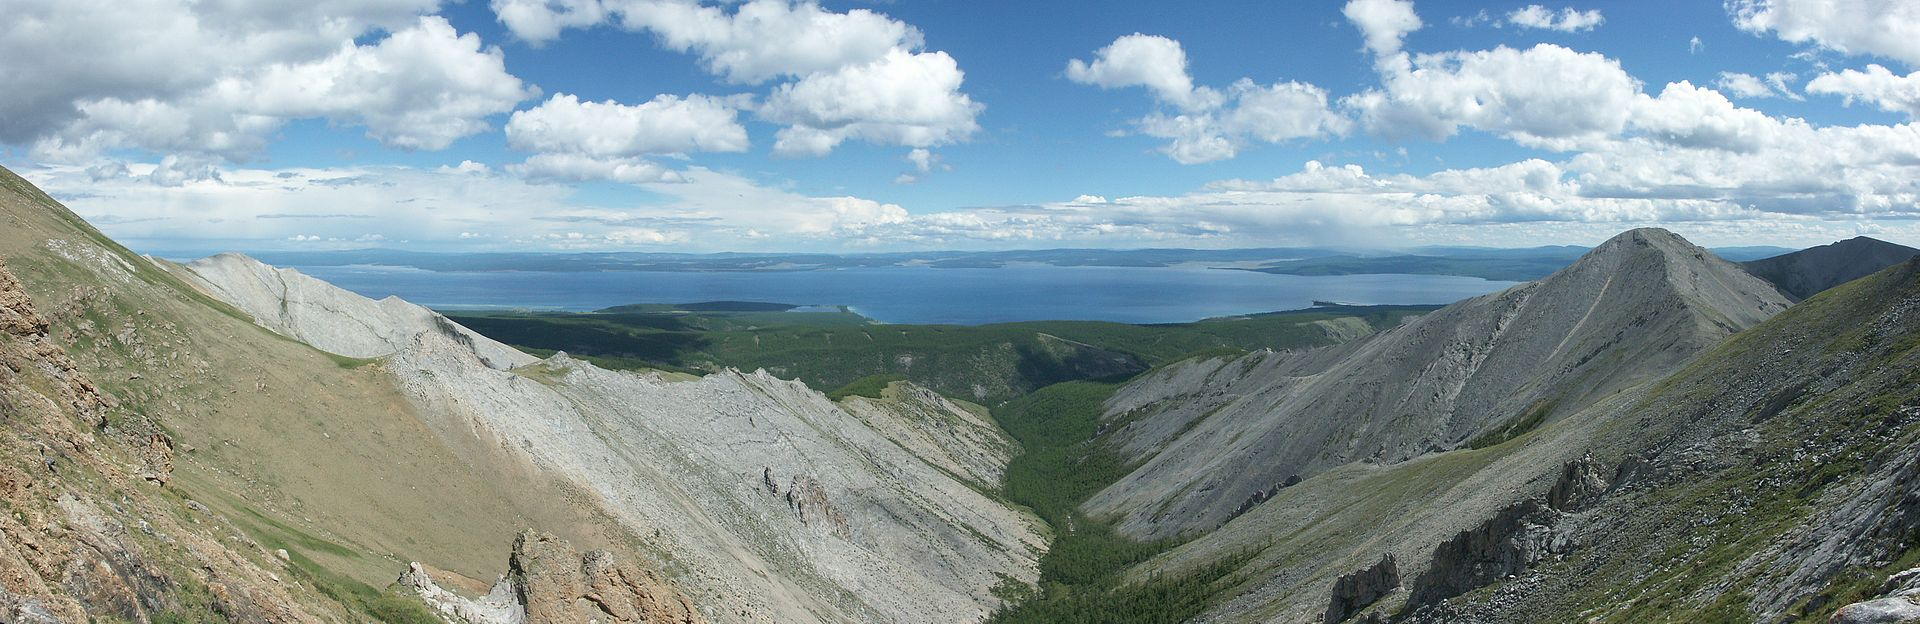 Panoramic_view_of_Lake_Kho%CC%88vsgo%CC%88l.jpg